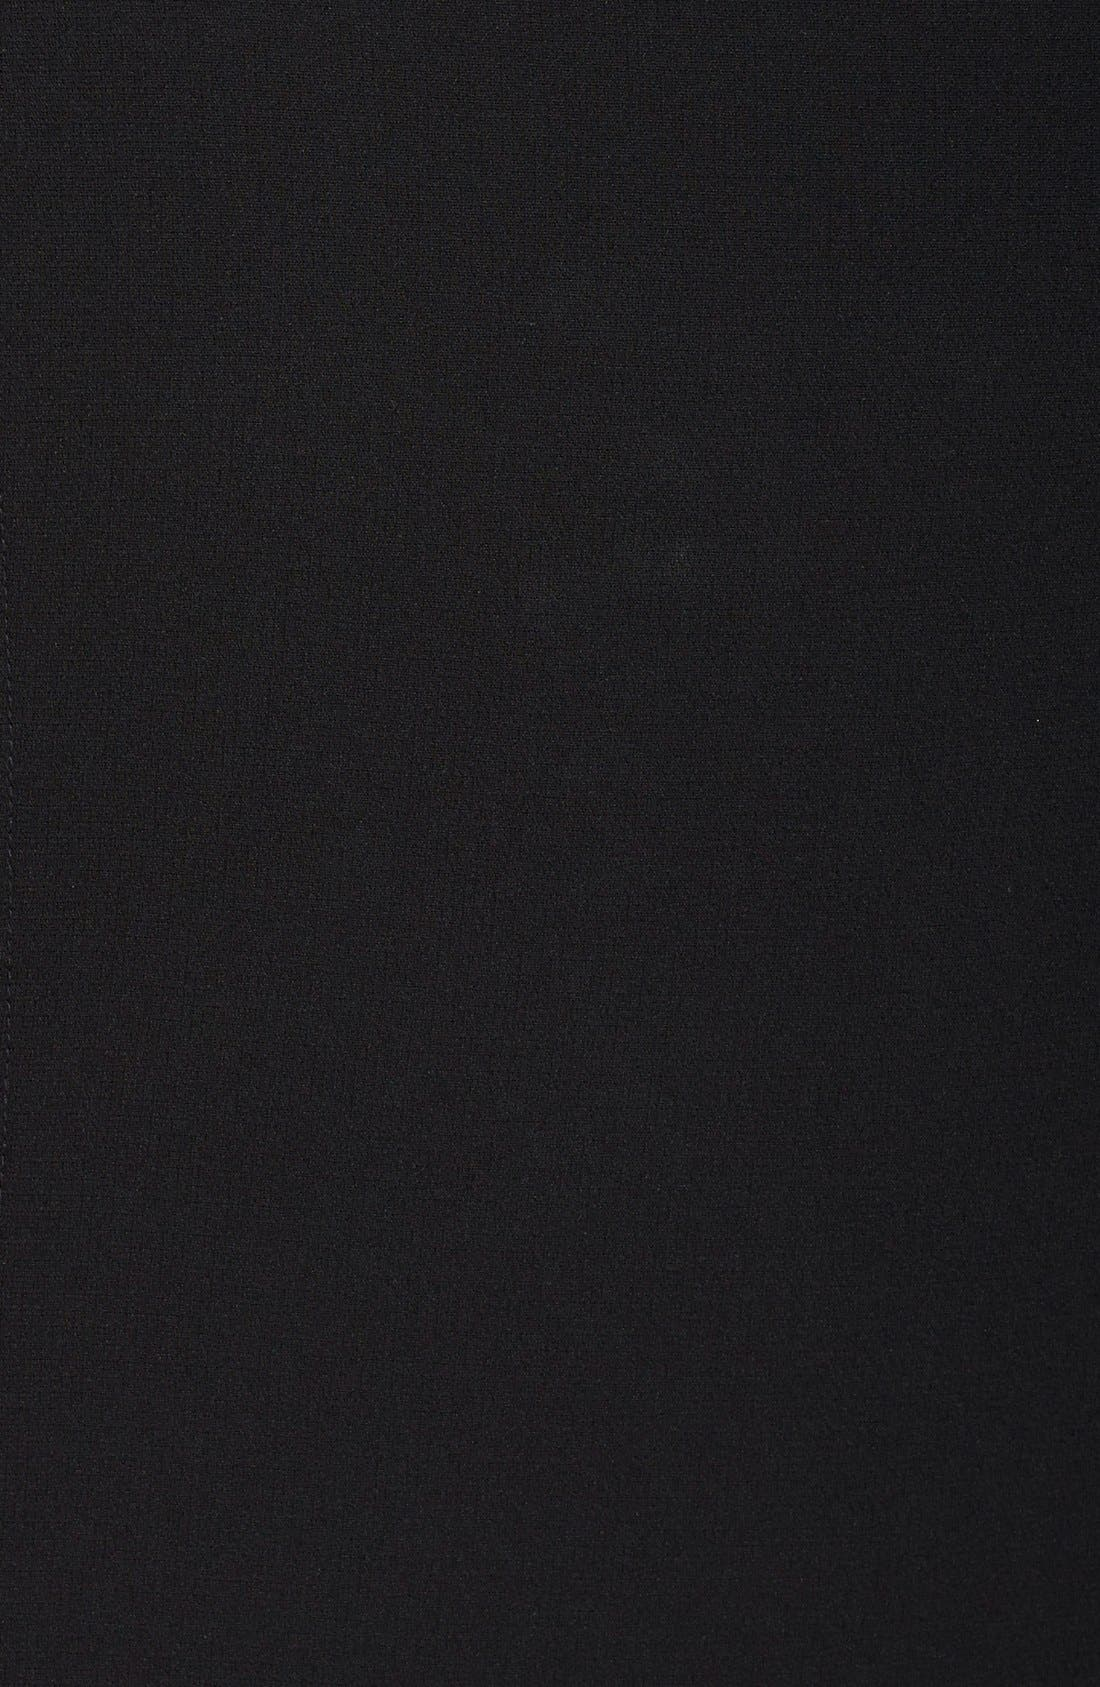 Sleeveless Suiting Sheath Dress,                             Alternate thumbnail 3, color,                             Black